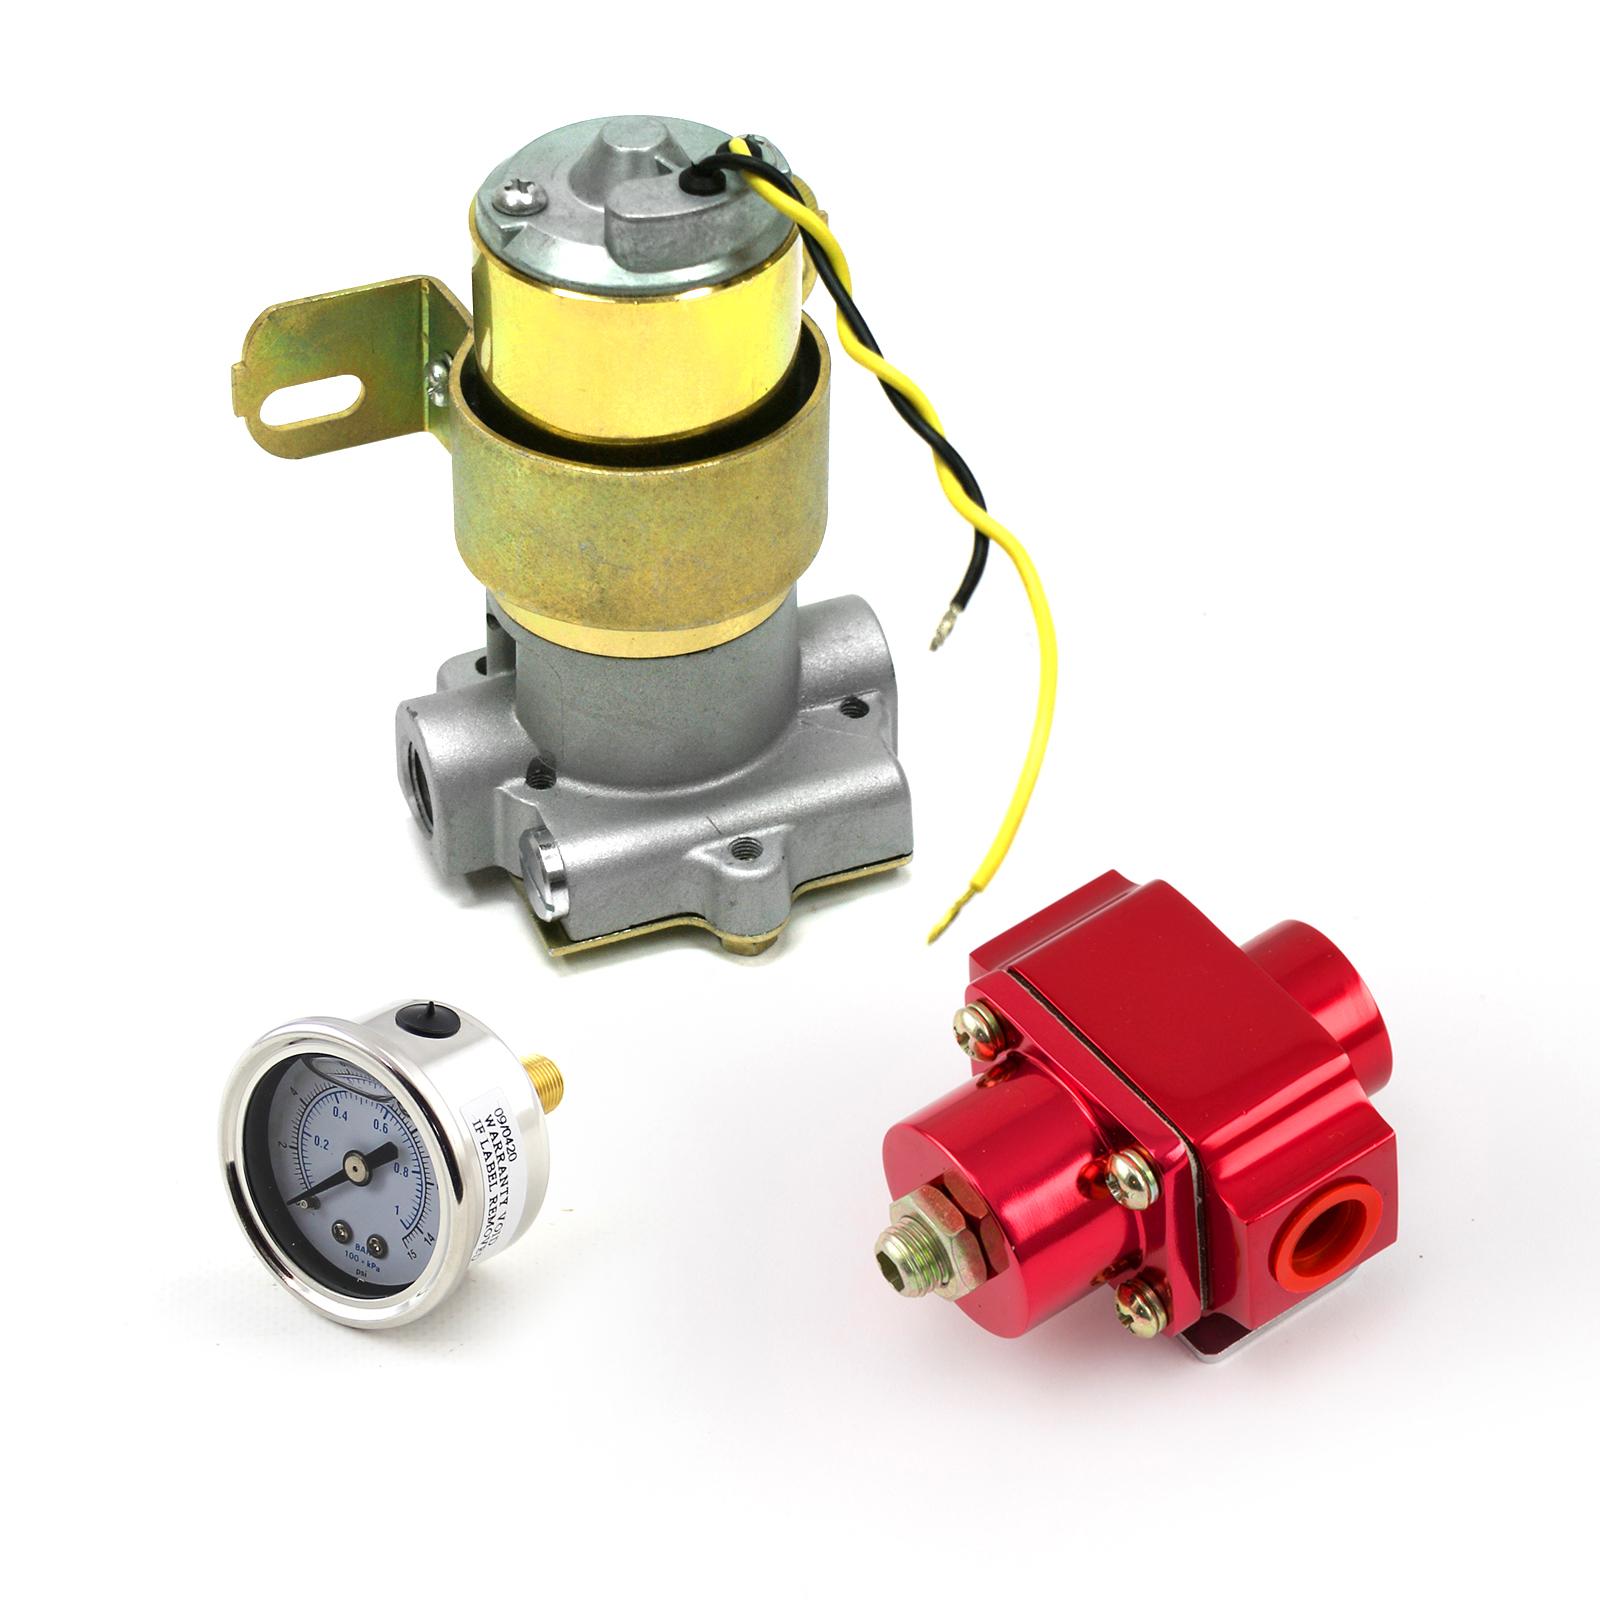 110 Gph Universal Electric Fuel Pump Red Regulator & Gauge Combo Kit